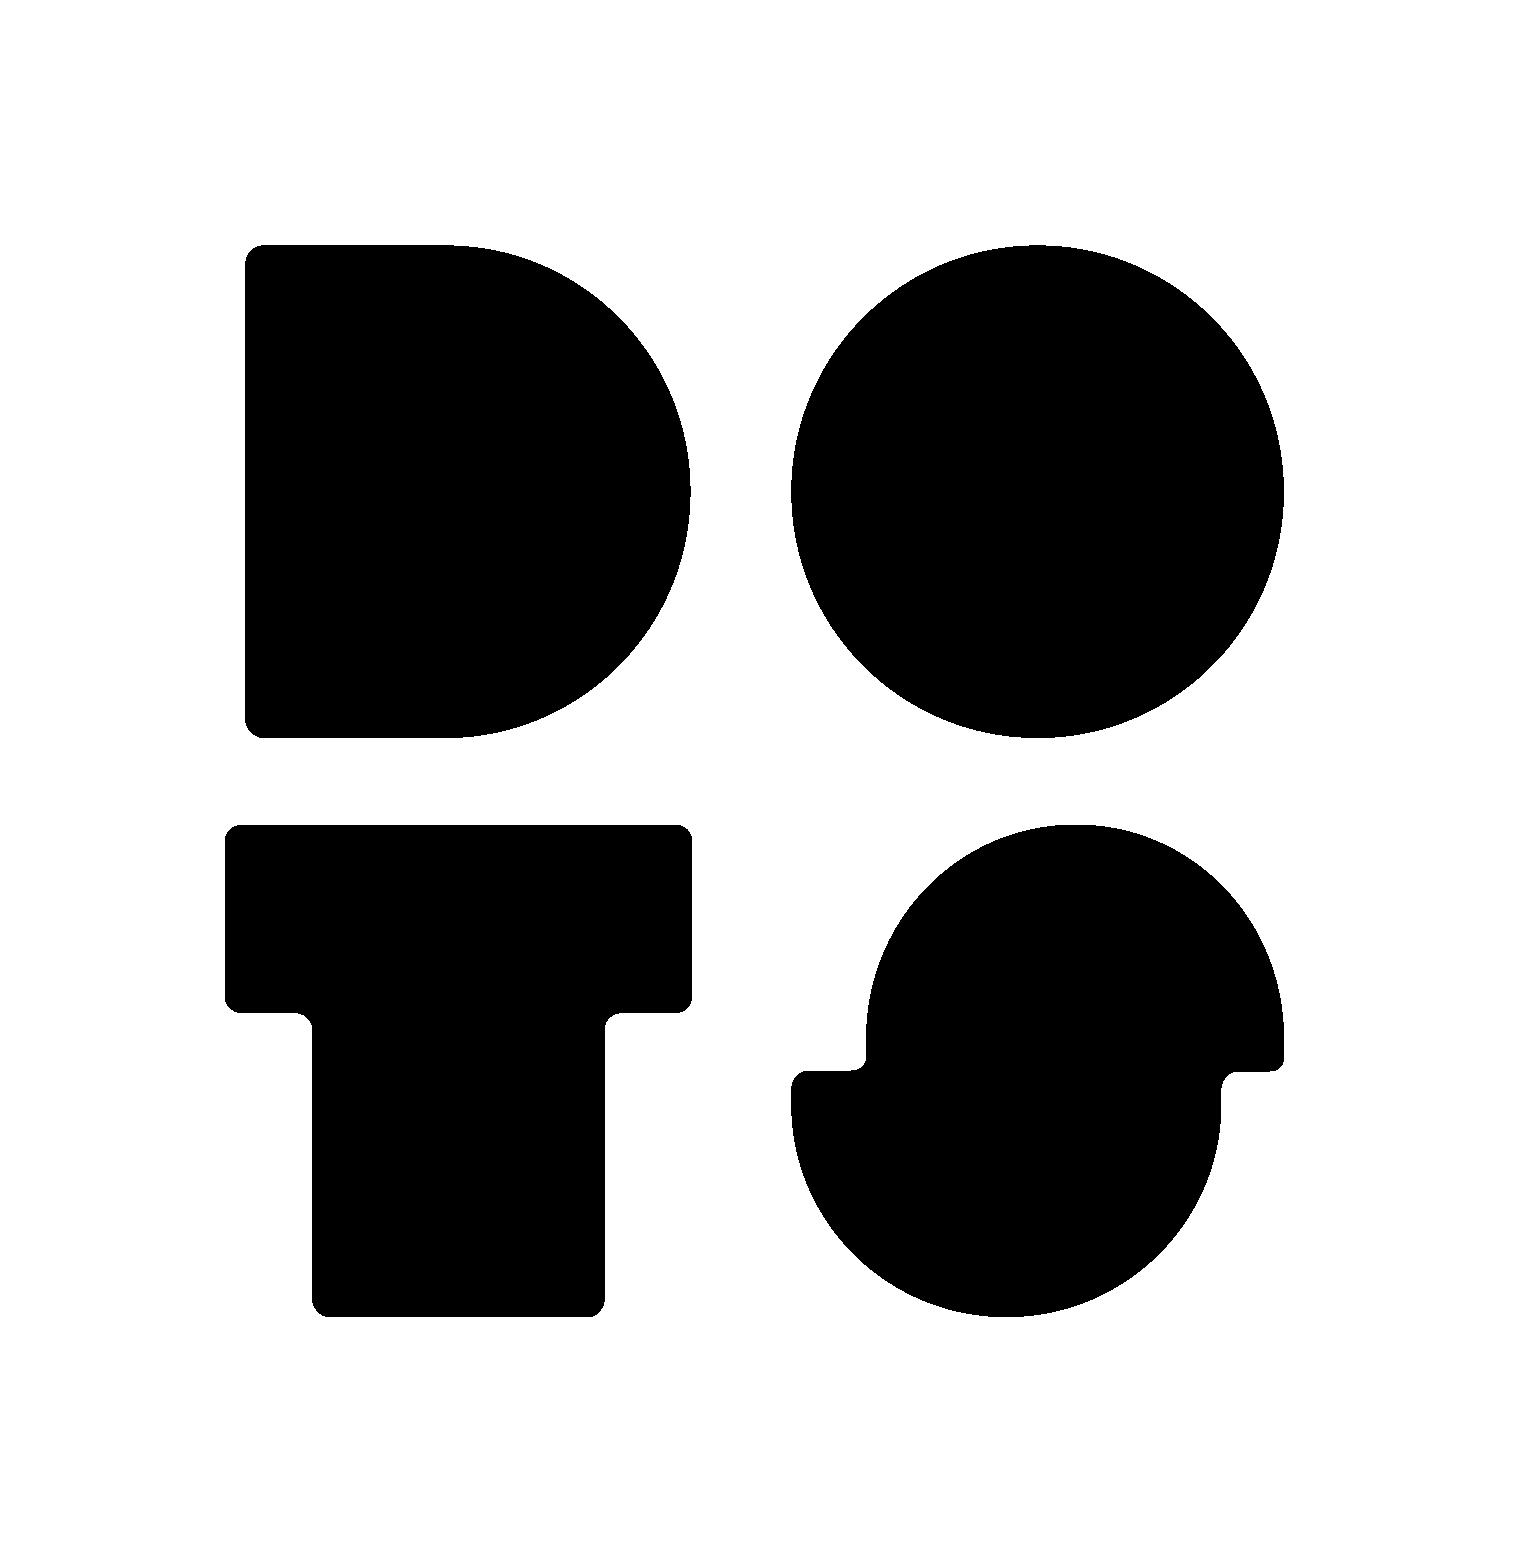 DOTS_LOGO LOCKUP_BLACK_01A.png